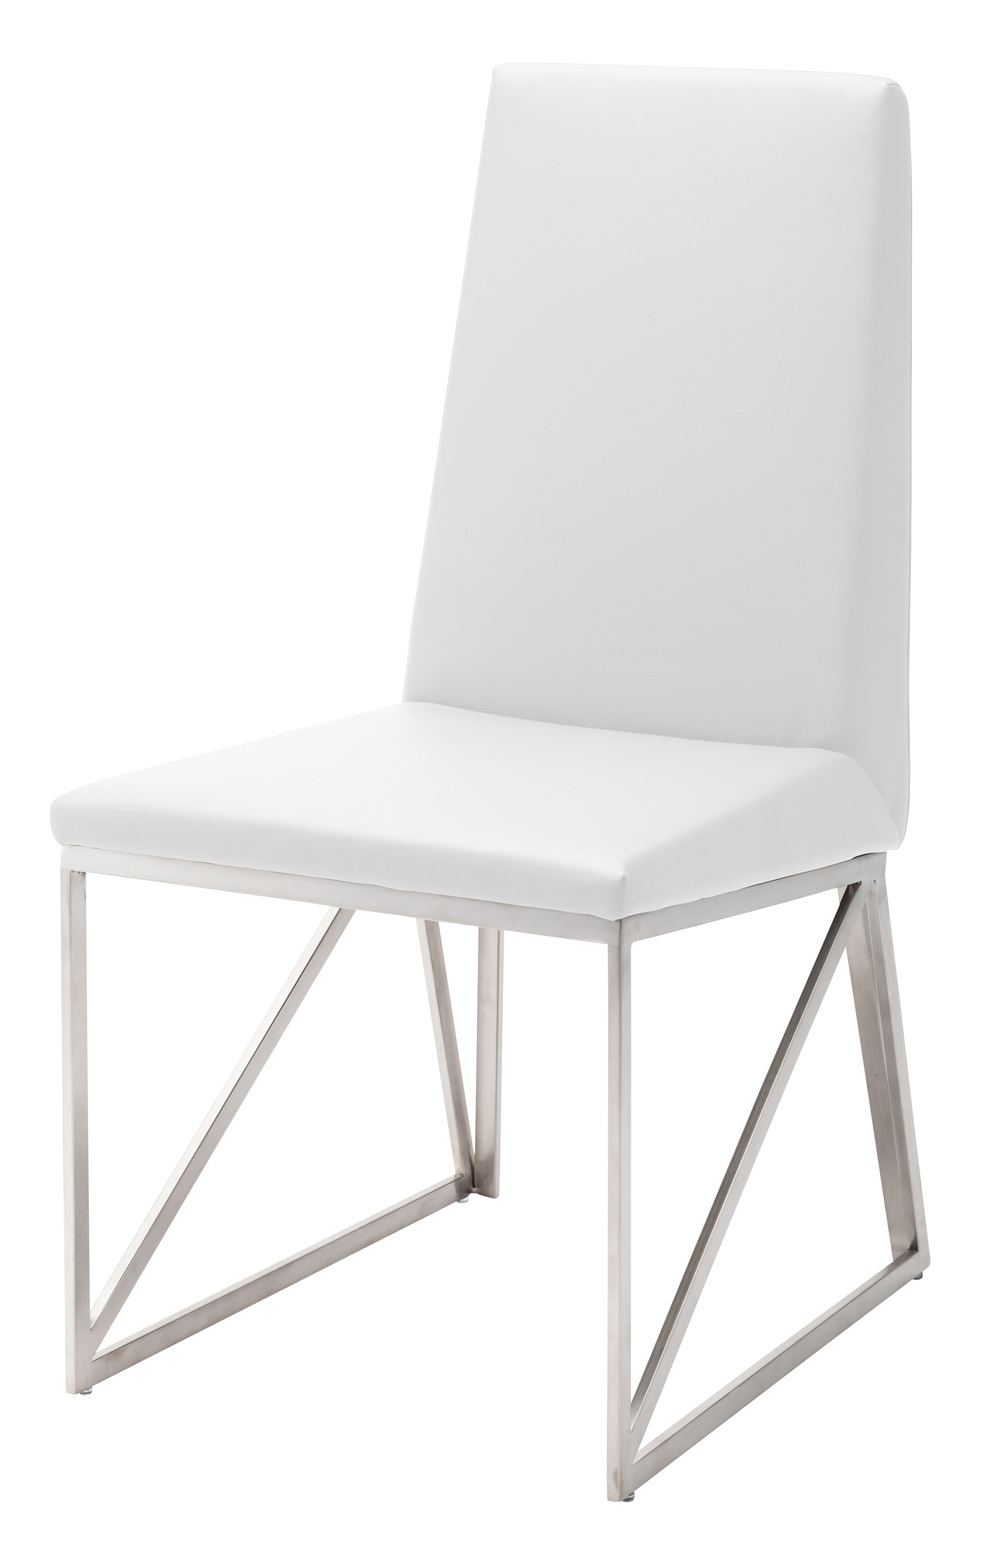 Nuevo - Caprice Dining Chair